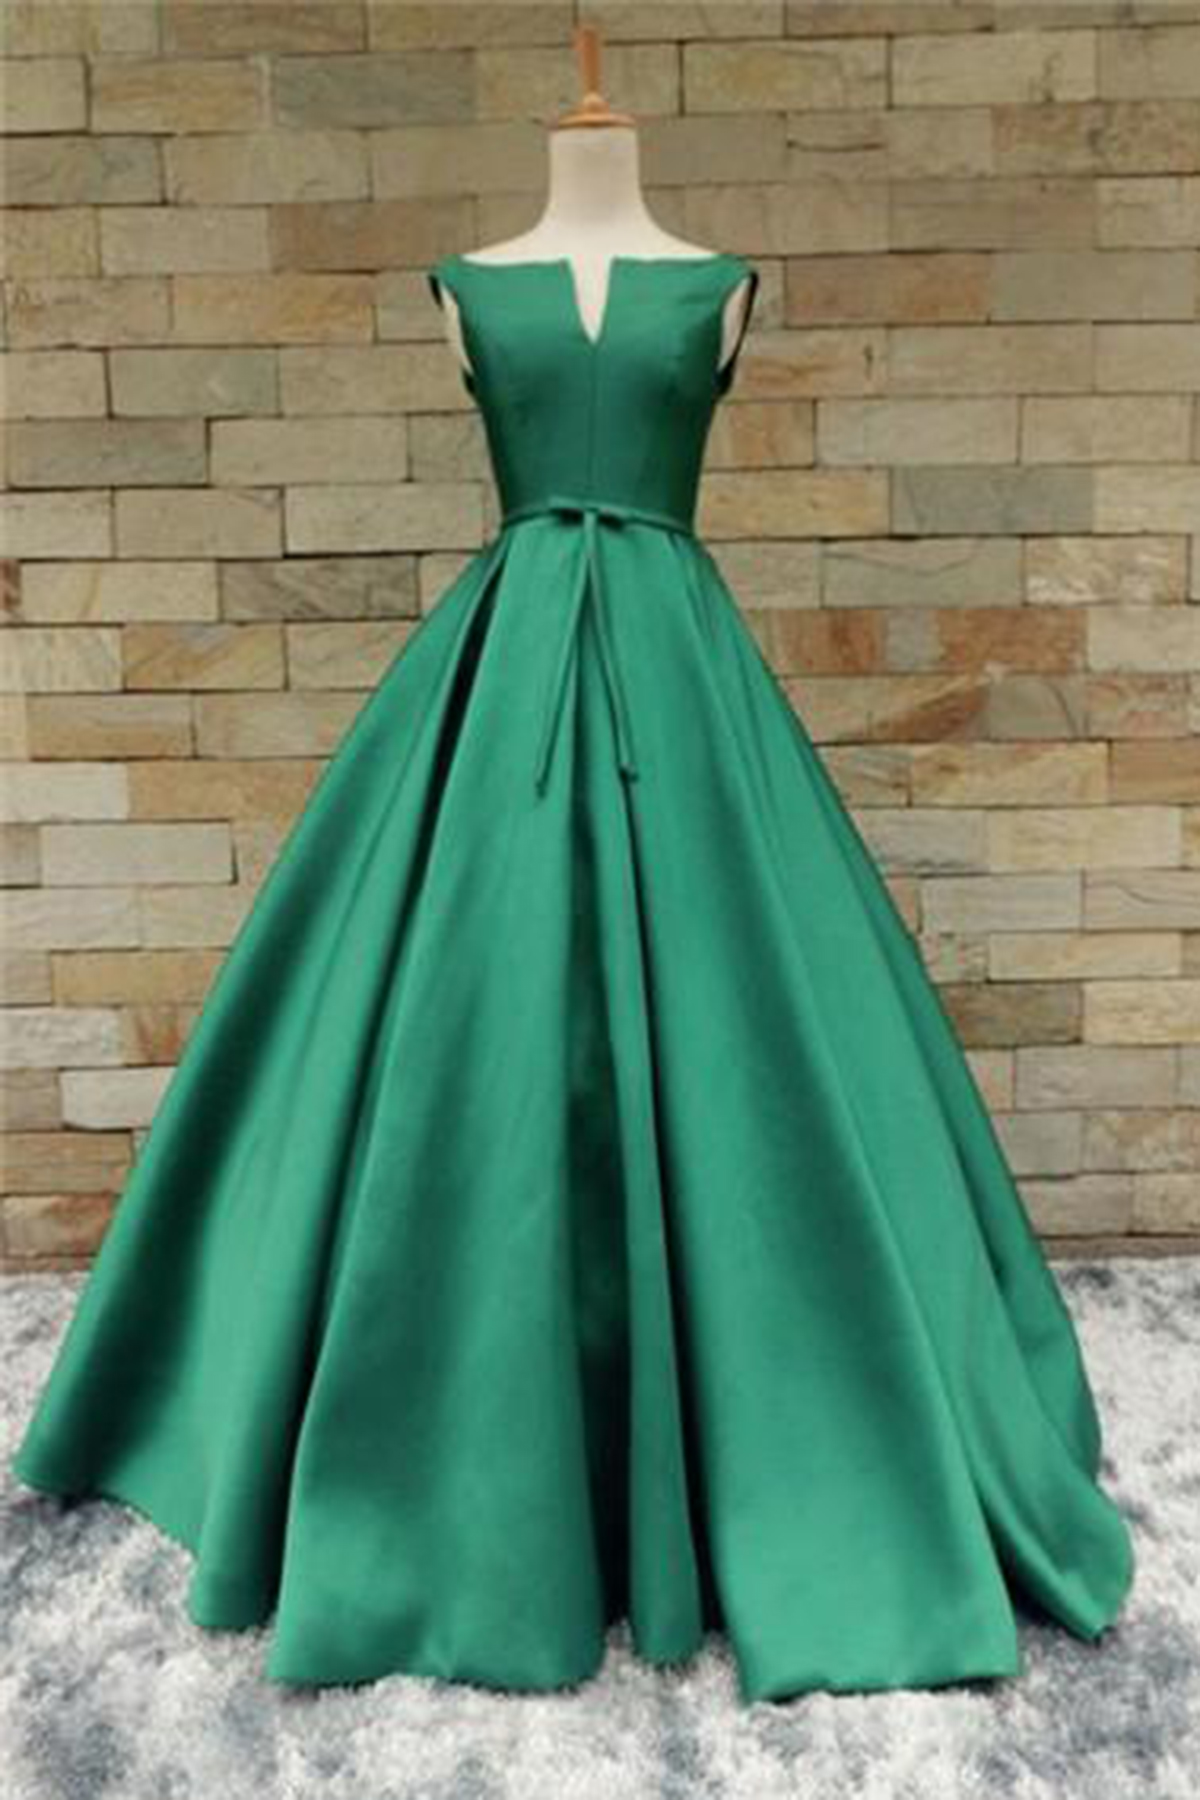 Green satin long V neckline senior prom dress with bowknot ...